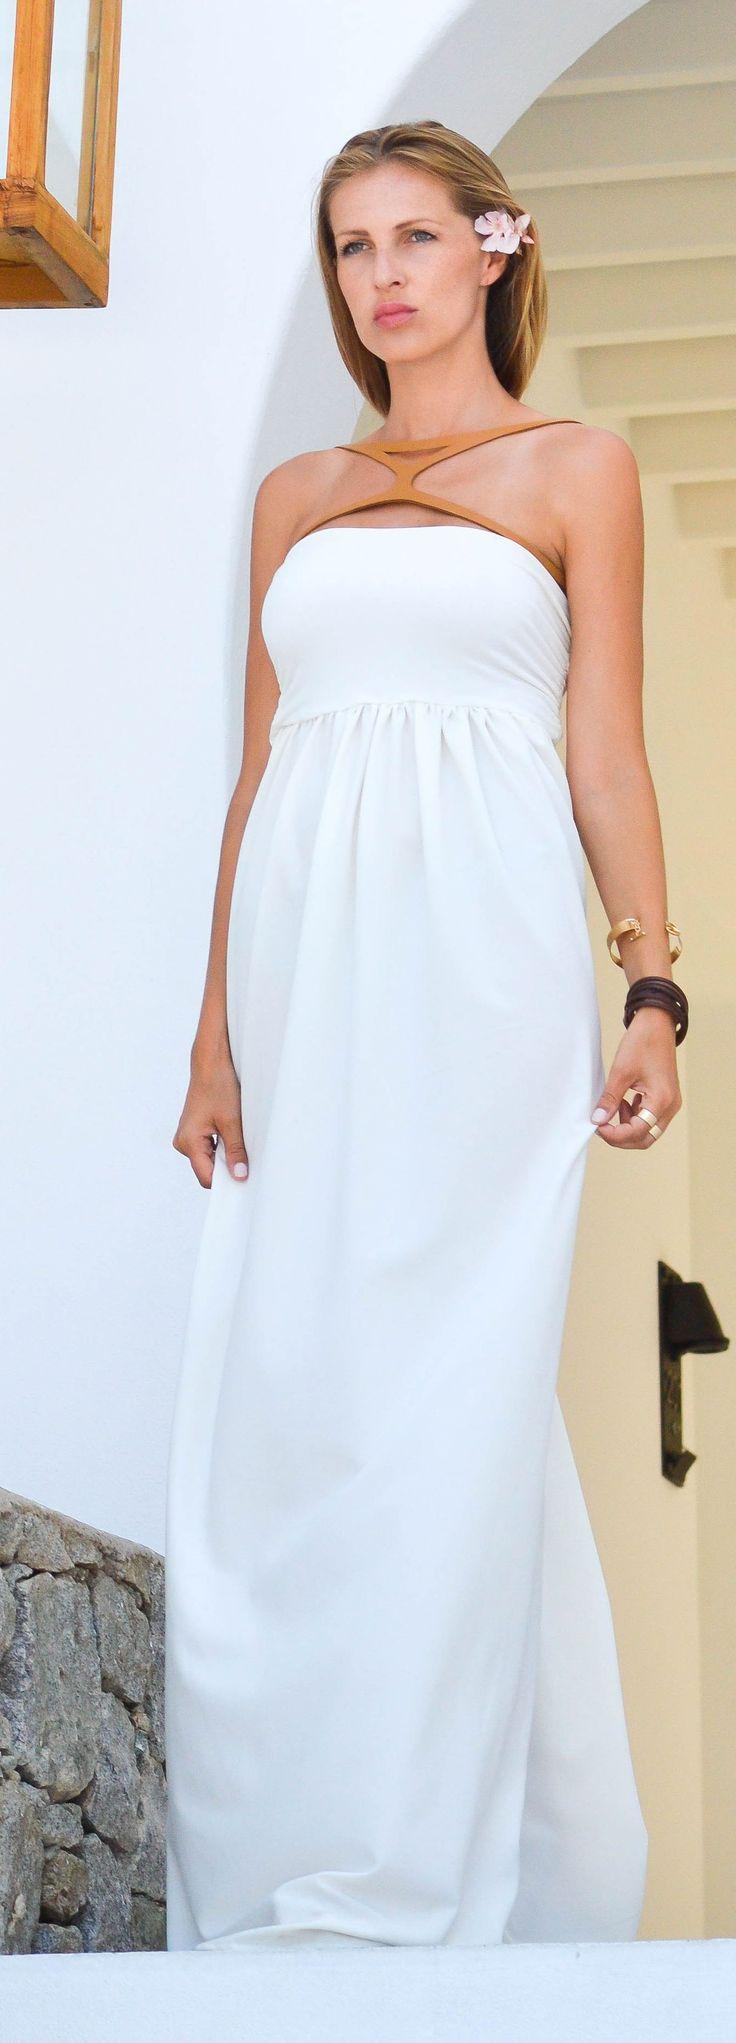 White And Camel  Maxi Dress #Fashionistas